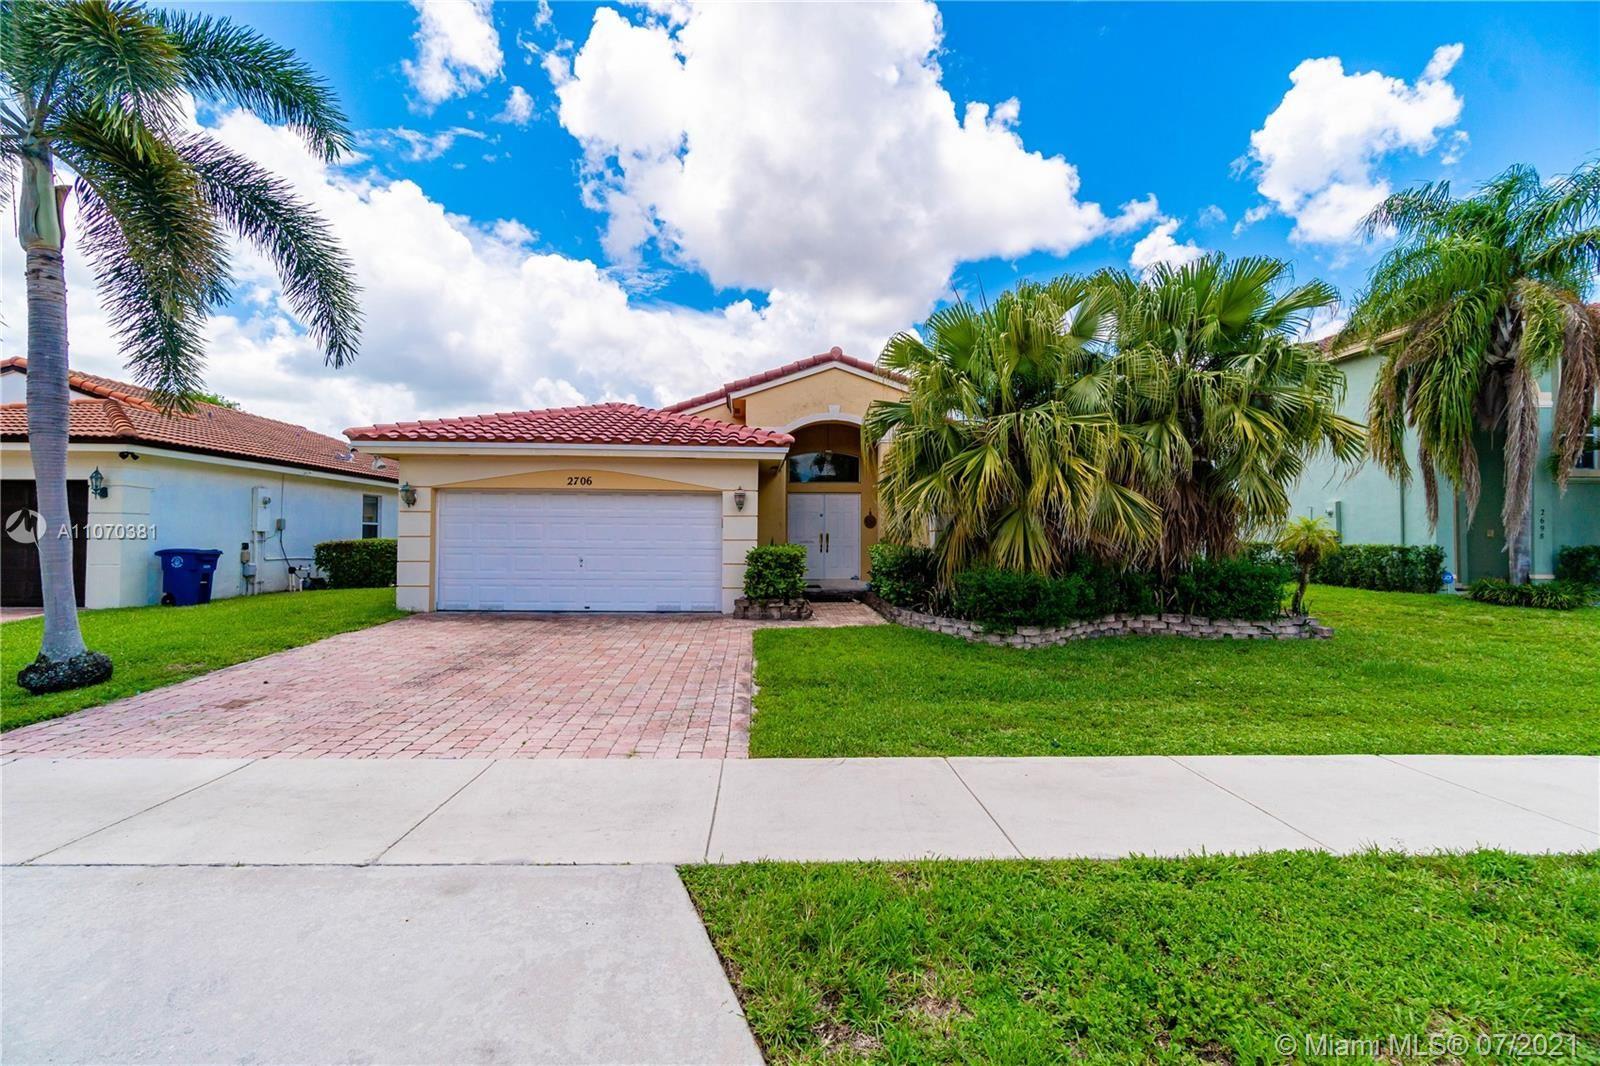 Photo of 2706 SW 139th Ave, Miramar, FL 33027 (MLS # A11070381)